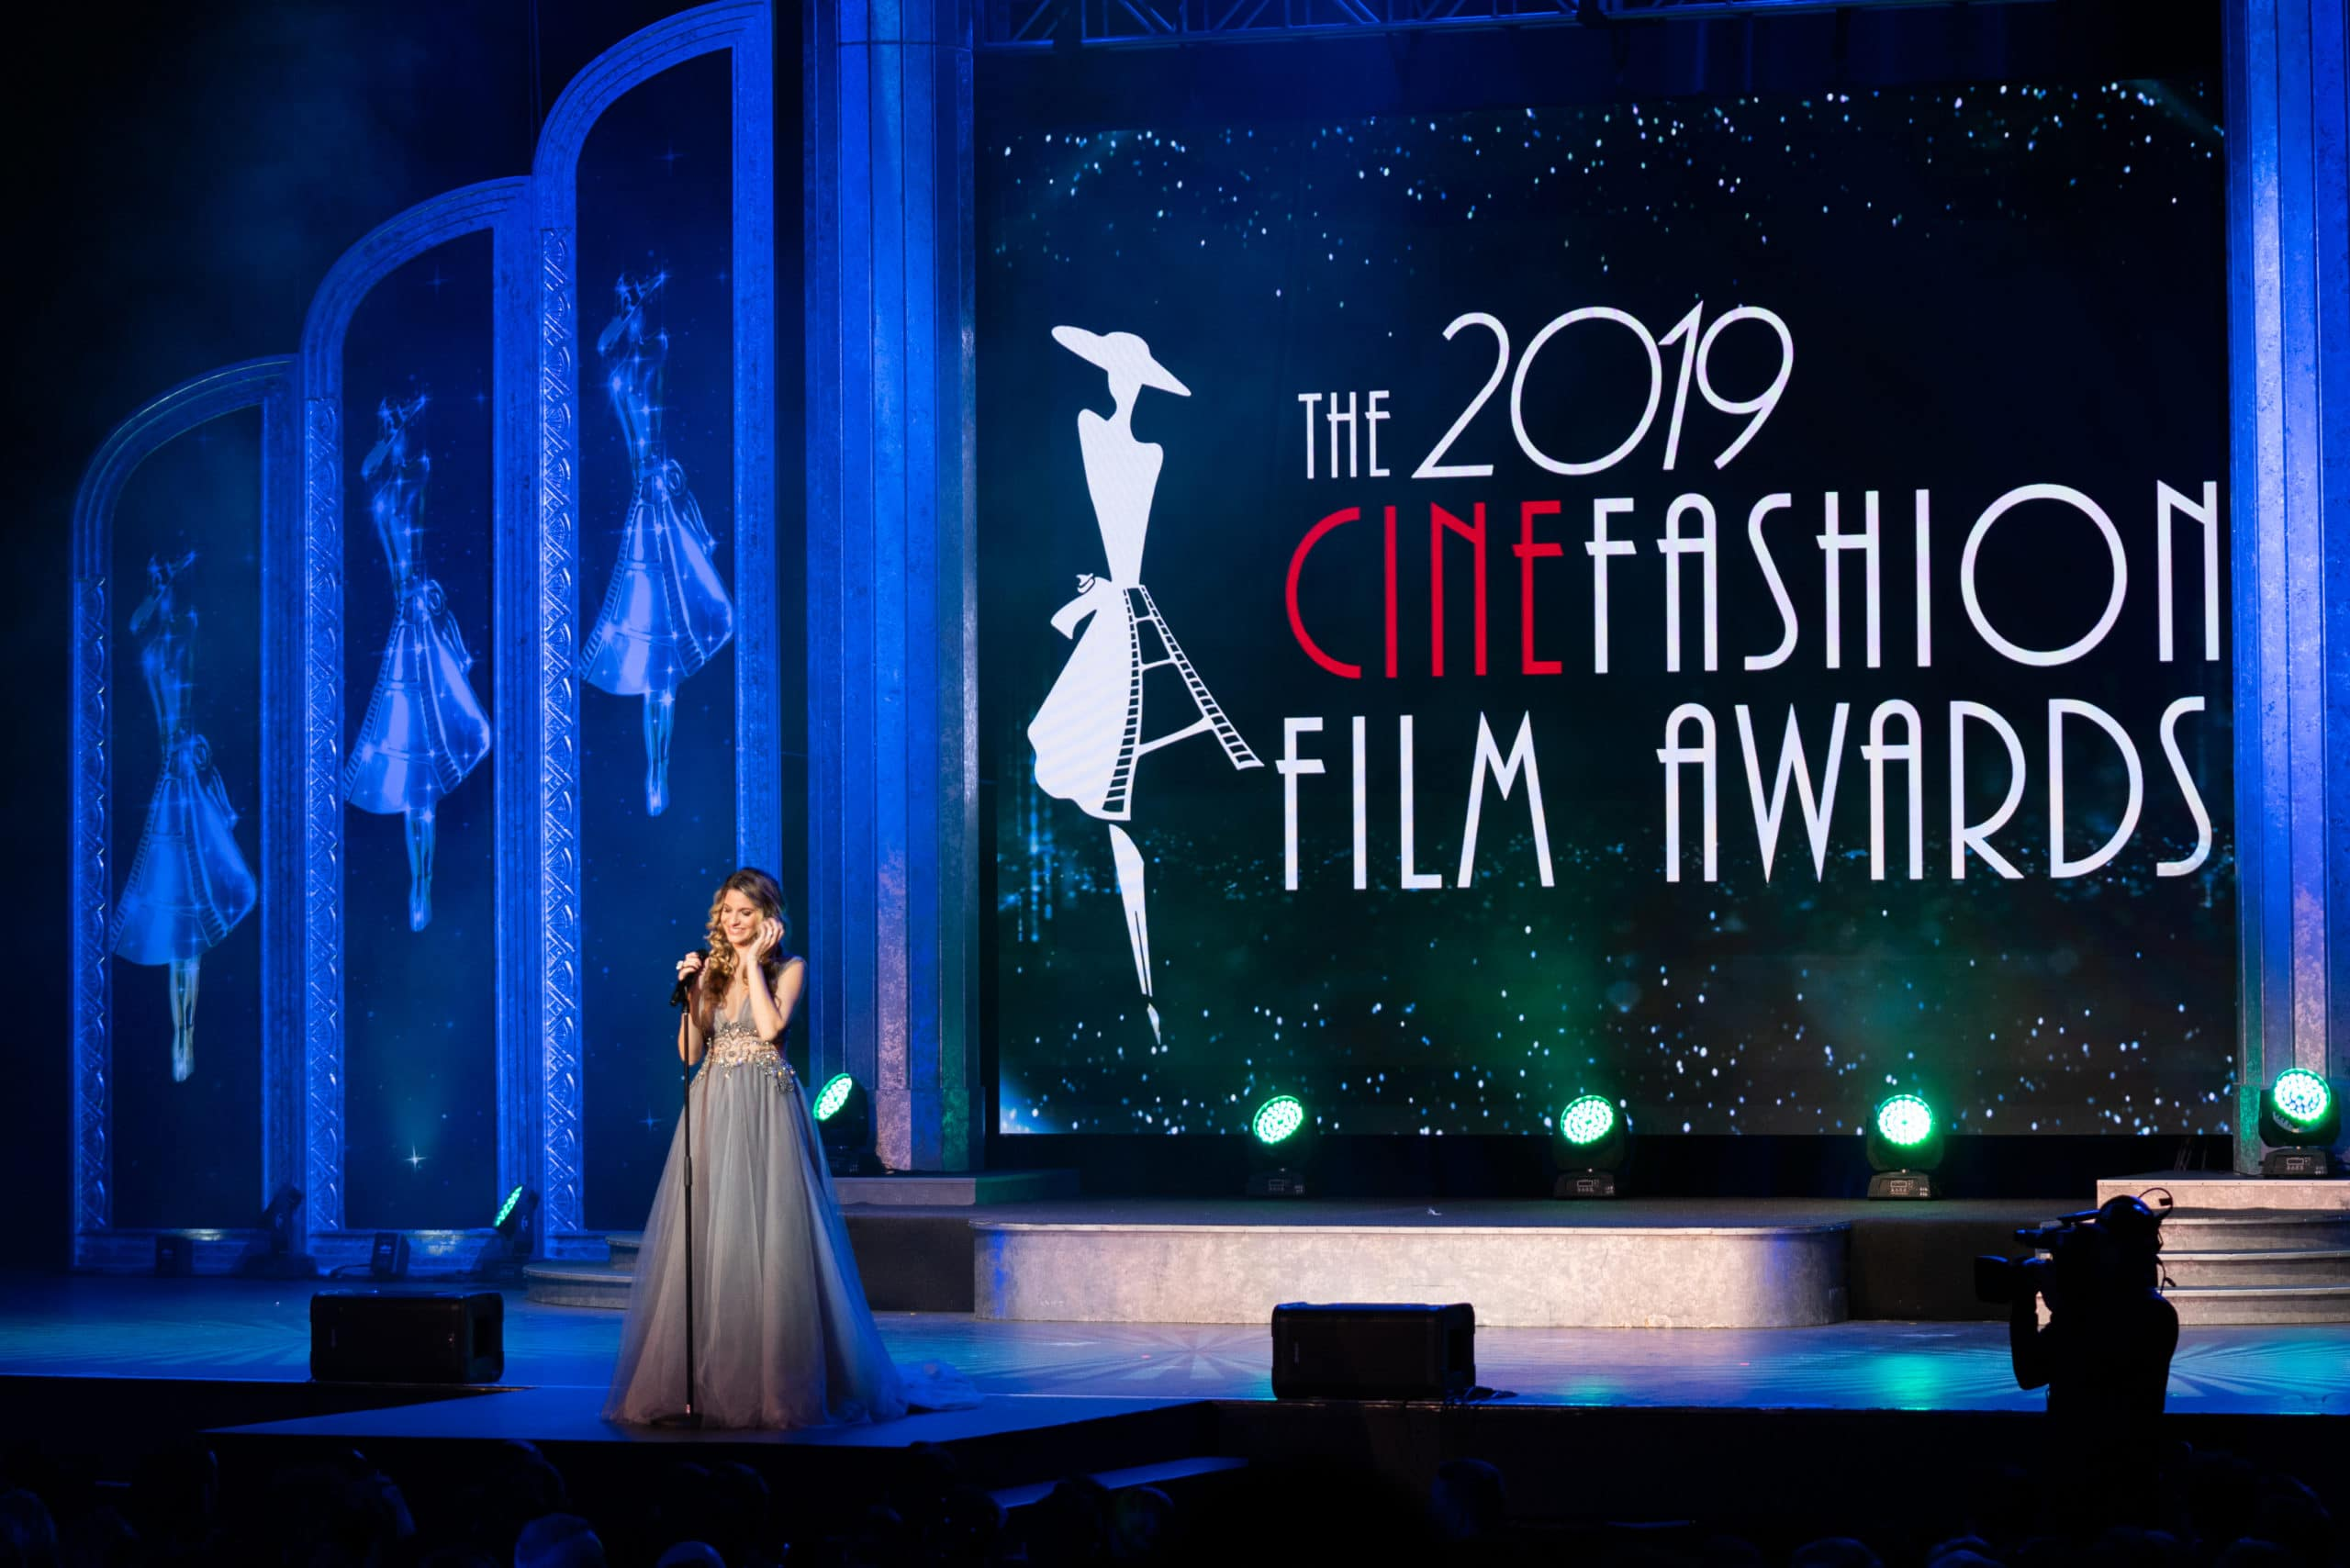 the CineFashion Film Awards 2019